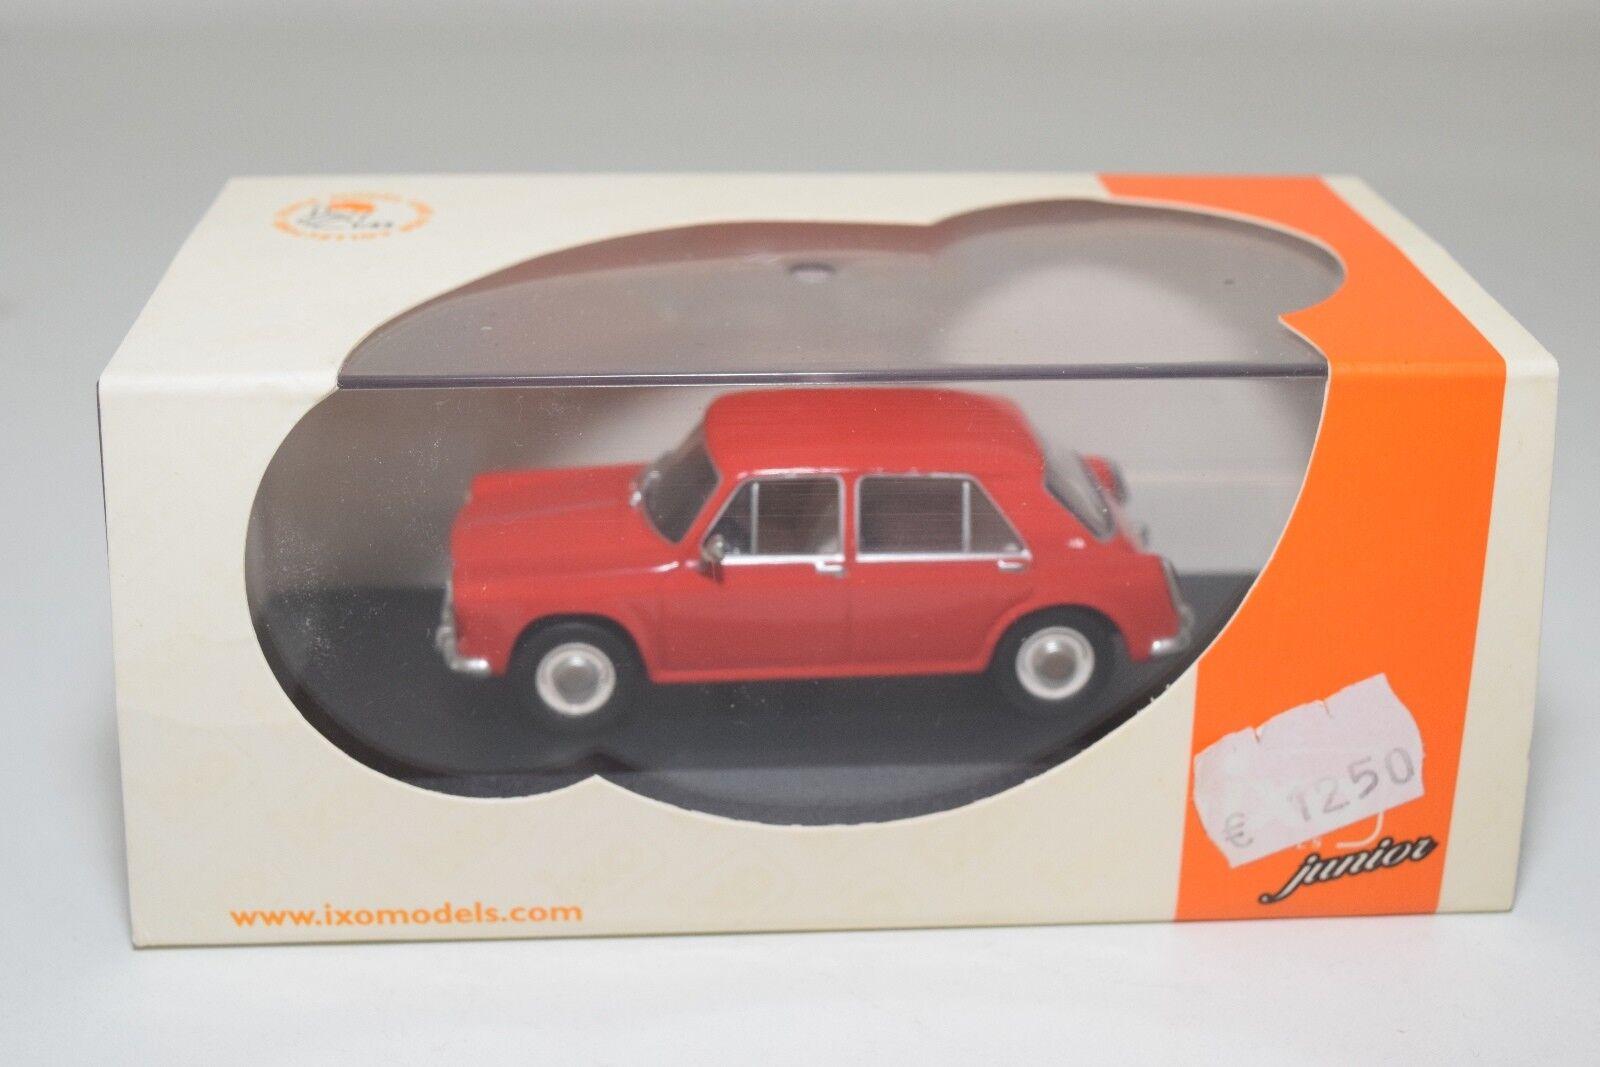 IXO CIXJ000013 MORRIS 1100 1967 rosso MINT BOXED RARE SELTEN RARO